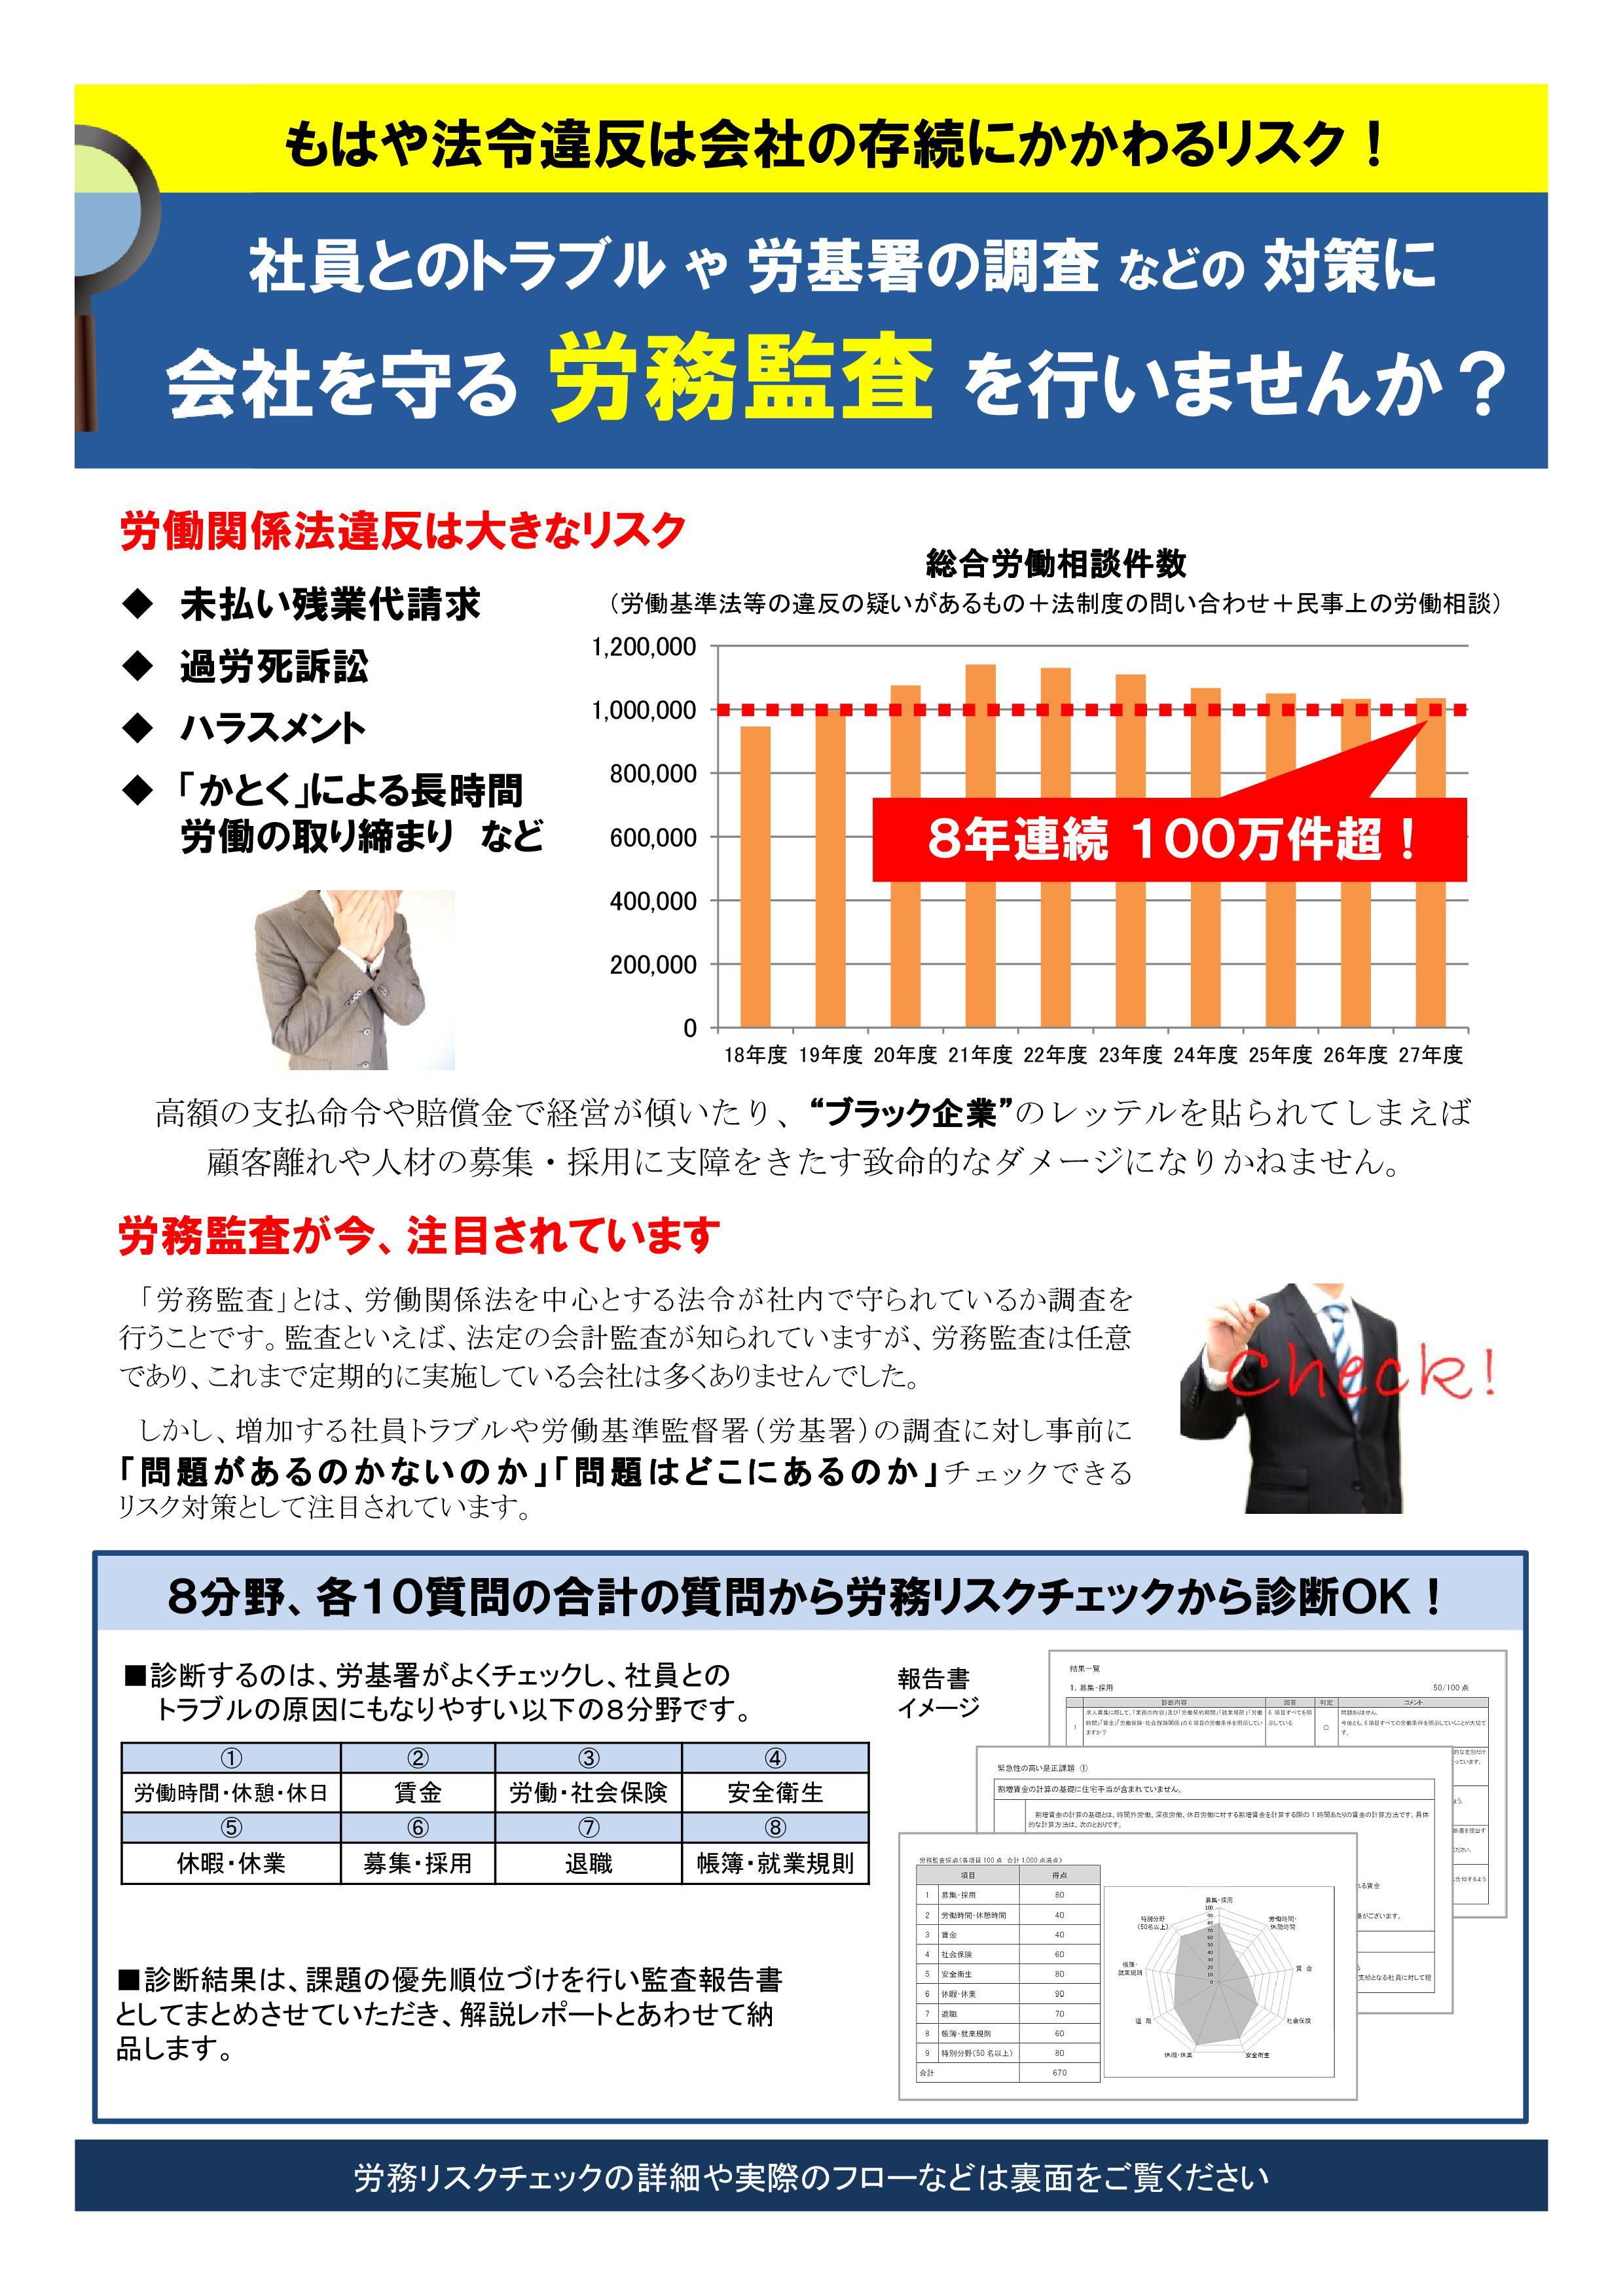 160801%e5%8a%b4%e5%8b%99%e7%9b%a3%e6%9f%bb%e3%83%81%e3%83%a9%e3%82%b7-001